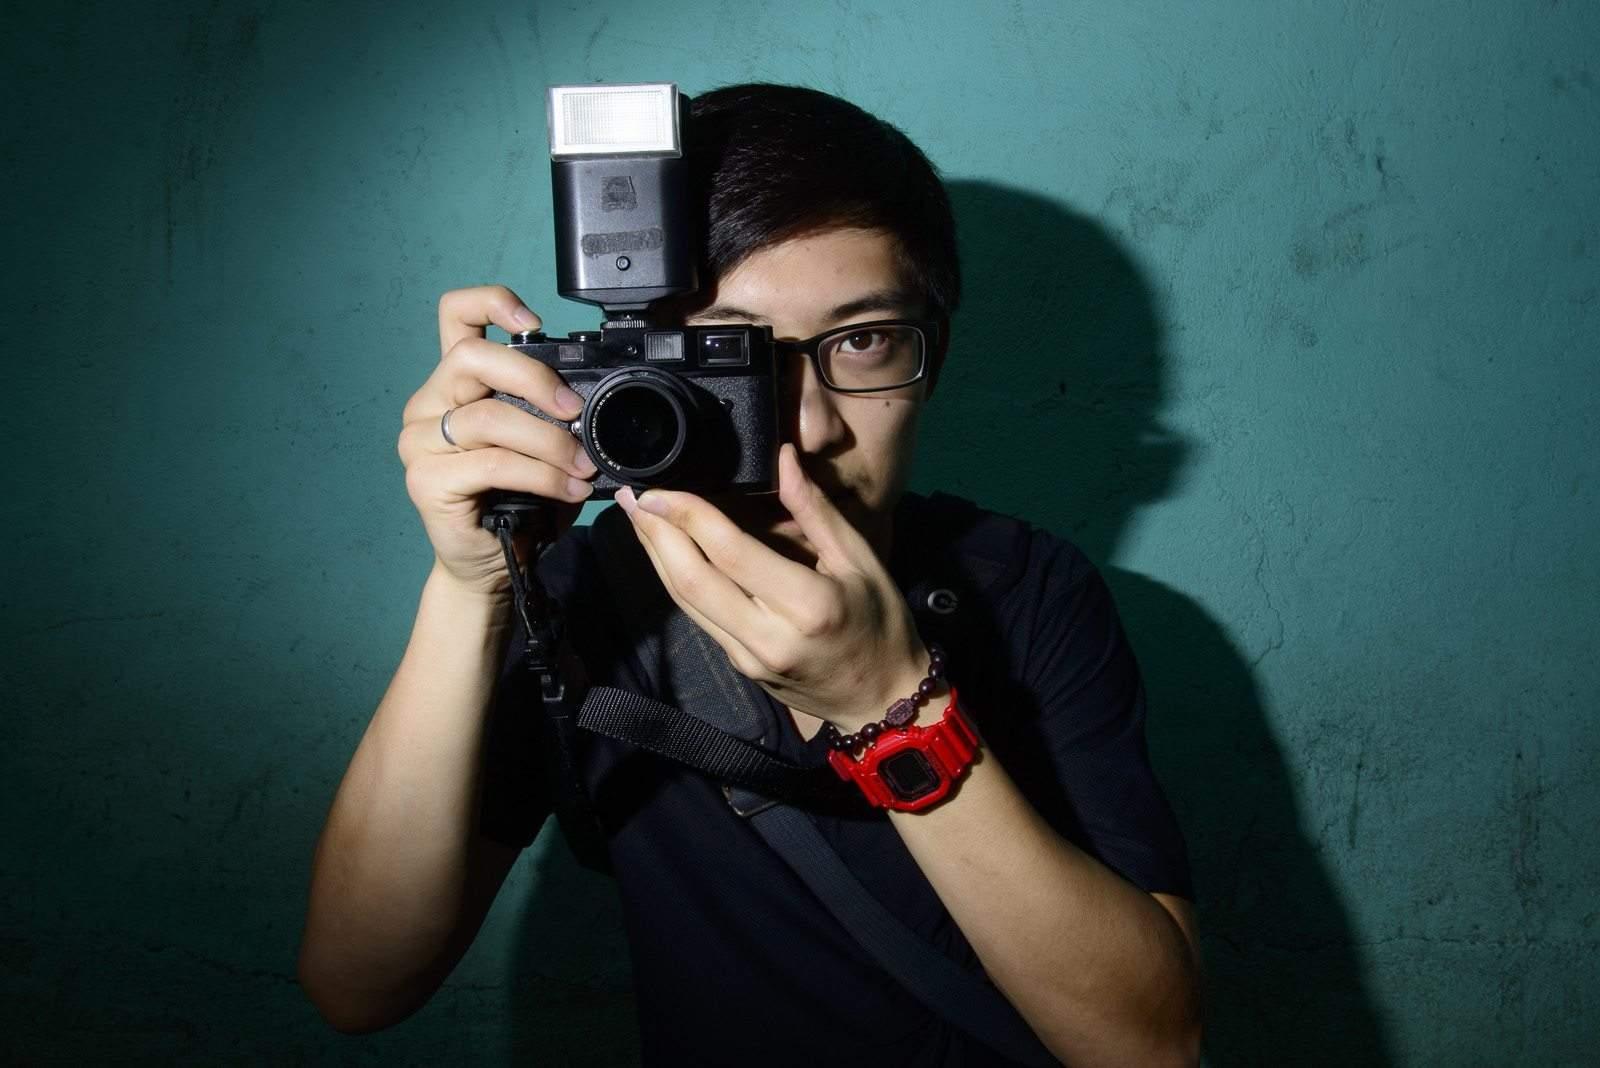 eric-kim-street-photography